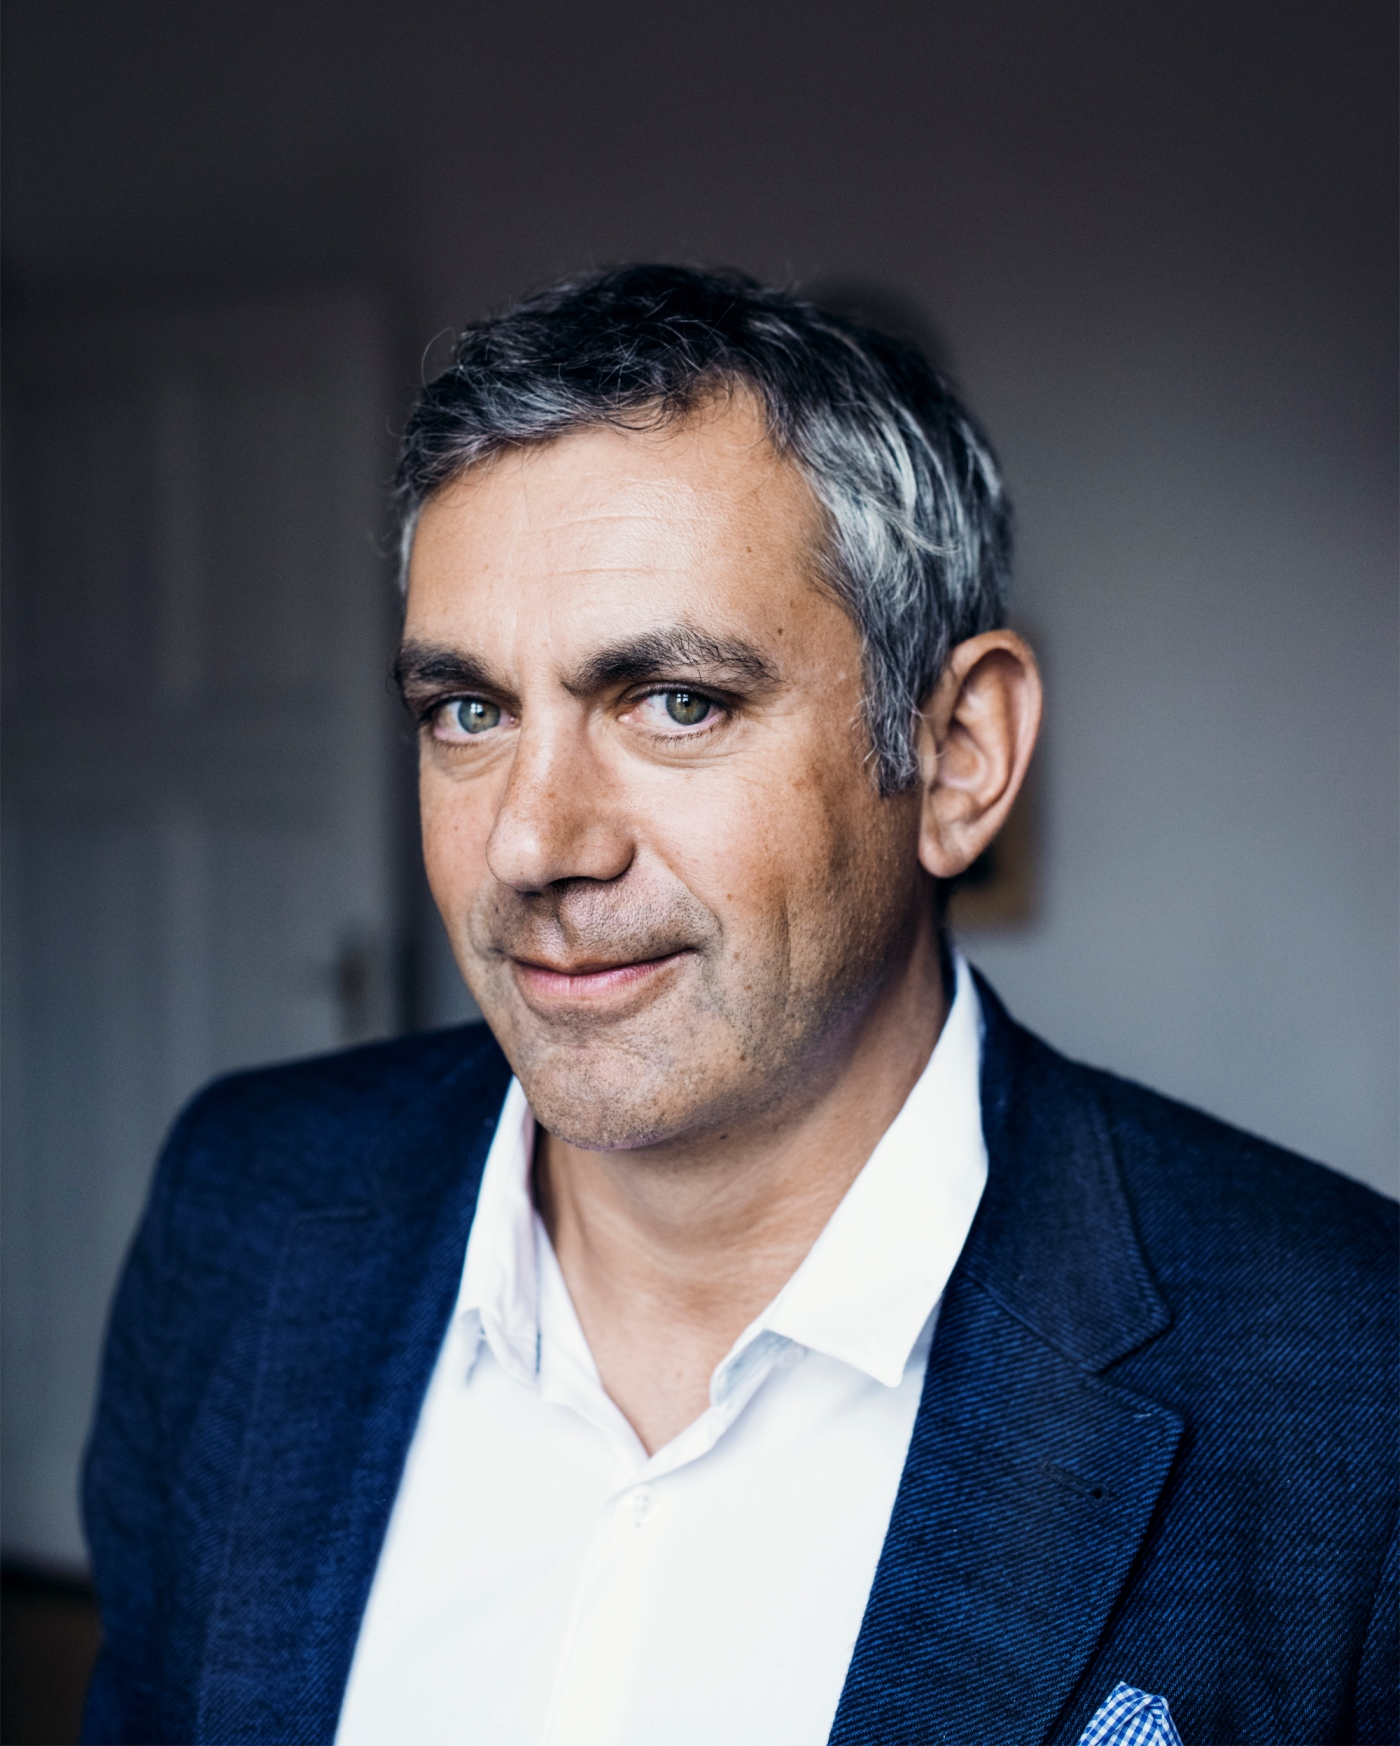 Wladimir Kaminer (Portraitfoto)